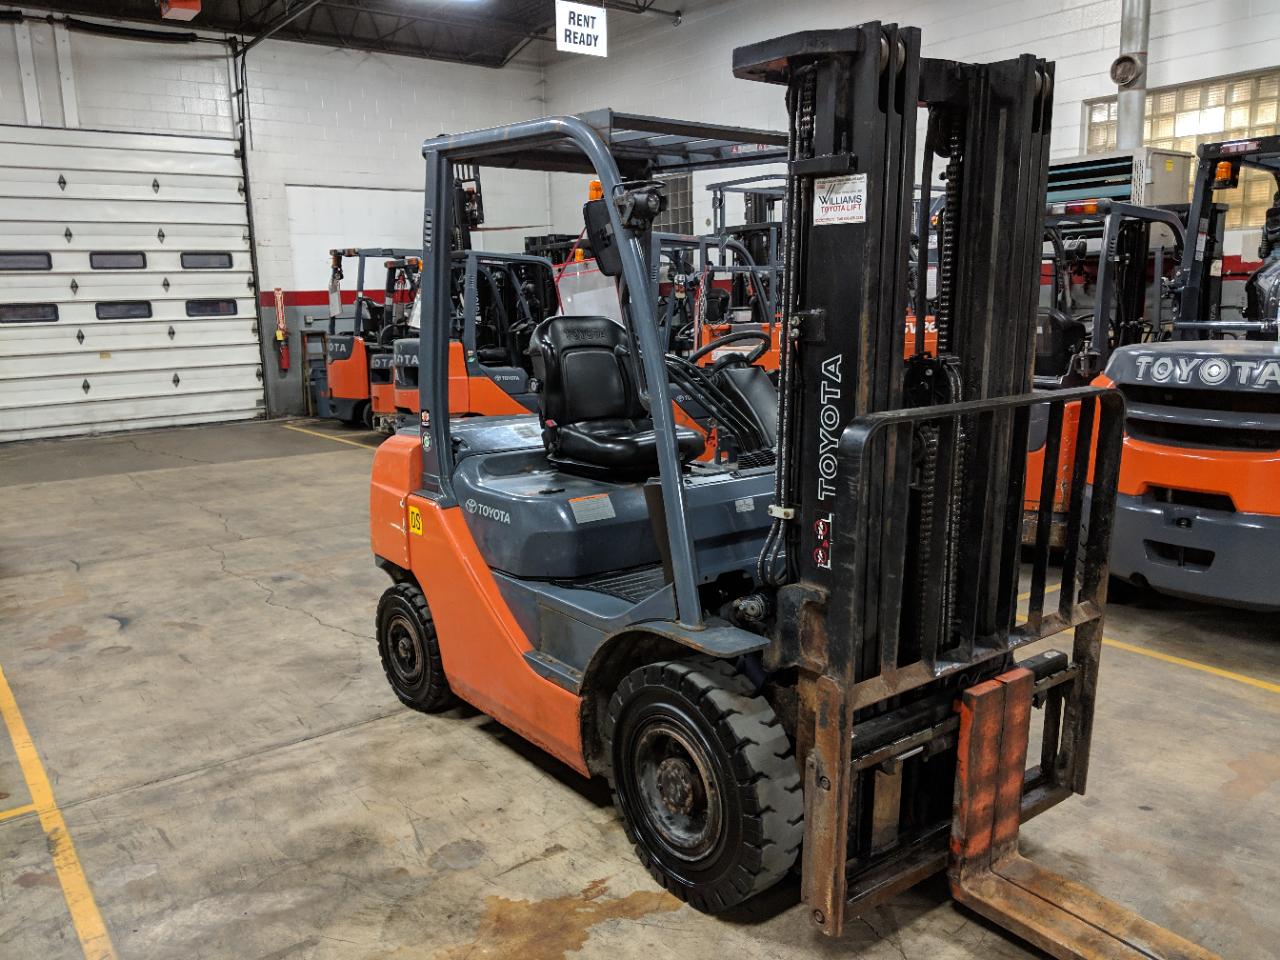 5000 lbs Capacity Pneumatic Diesel - Williams Toyota Lift, Inc